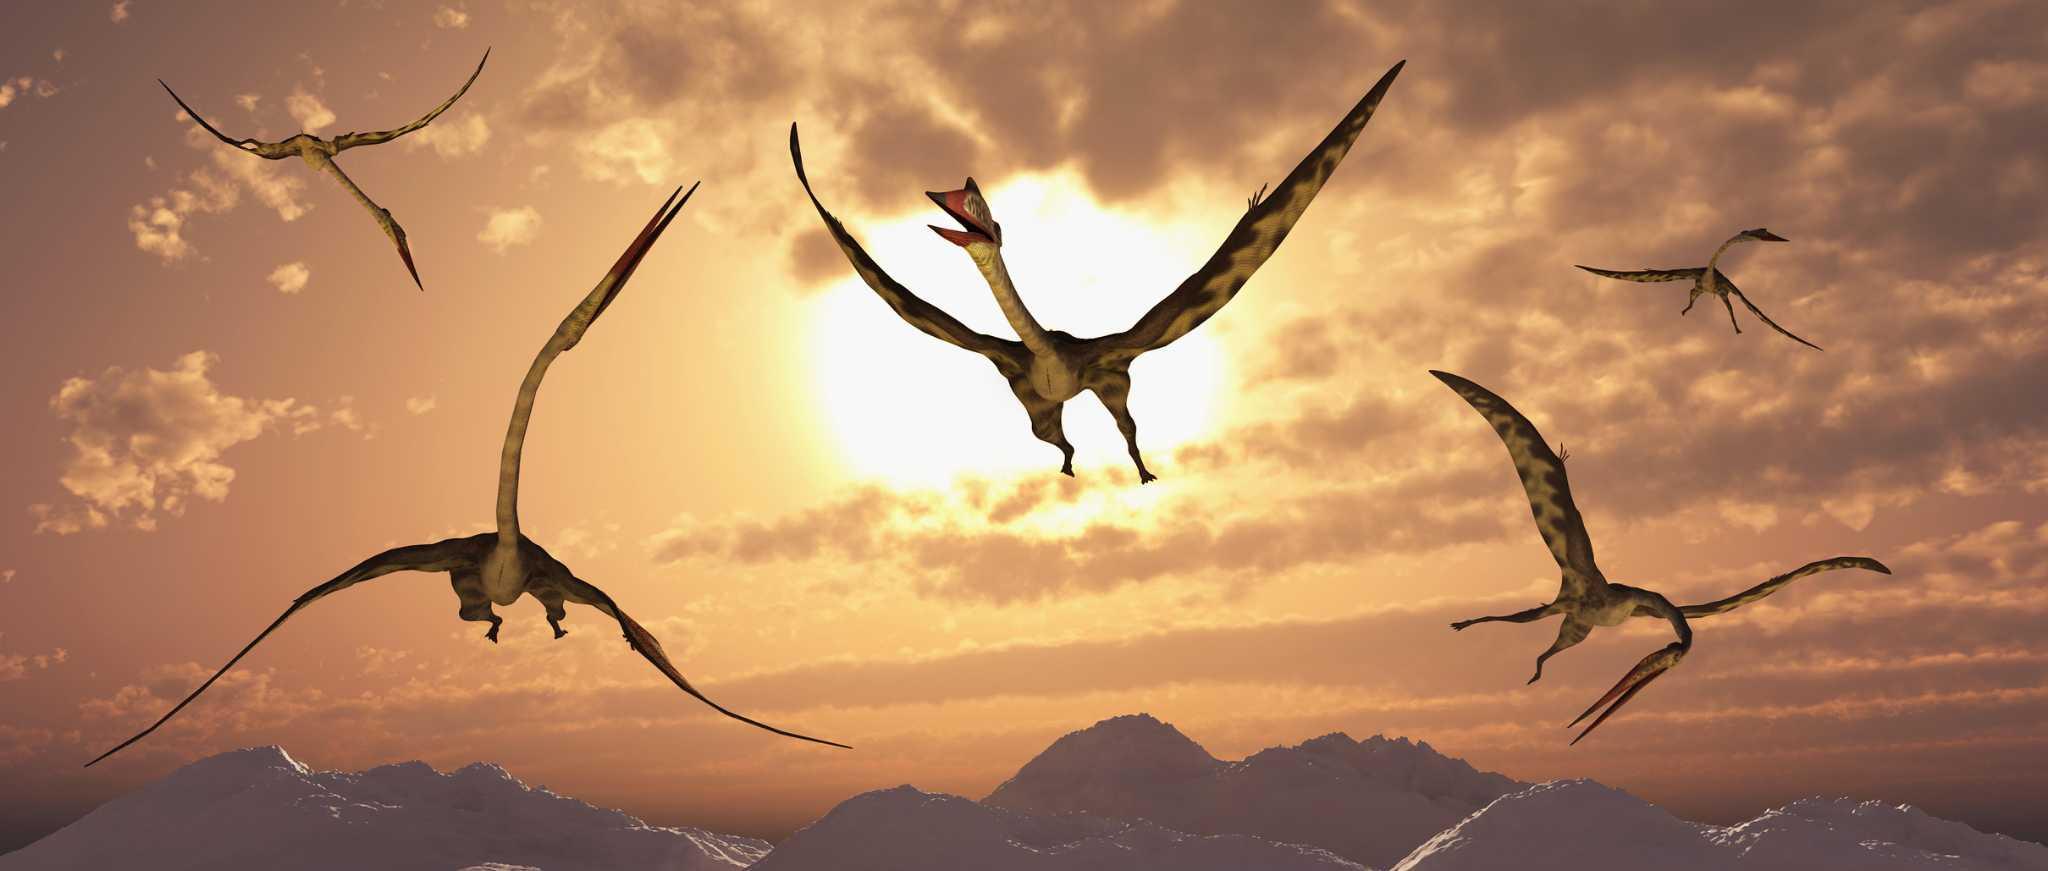 San Antonio,was home to biggest flying 'dinosaur' ever